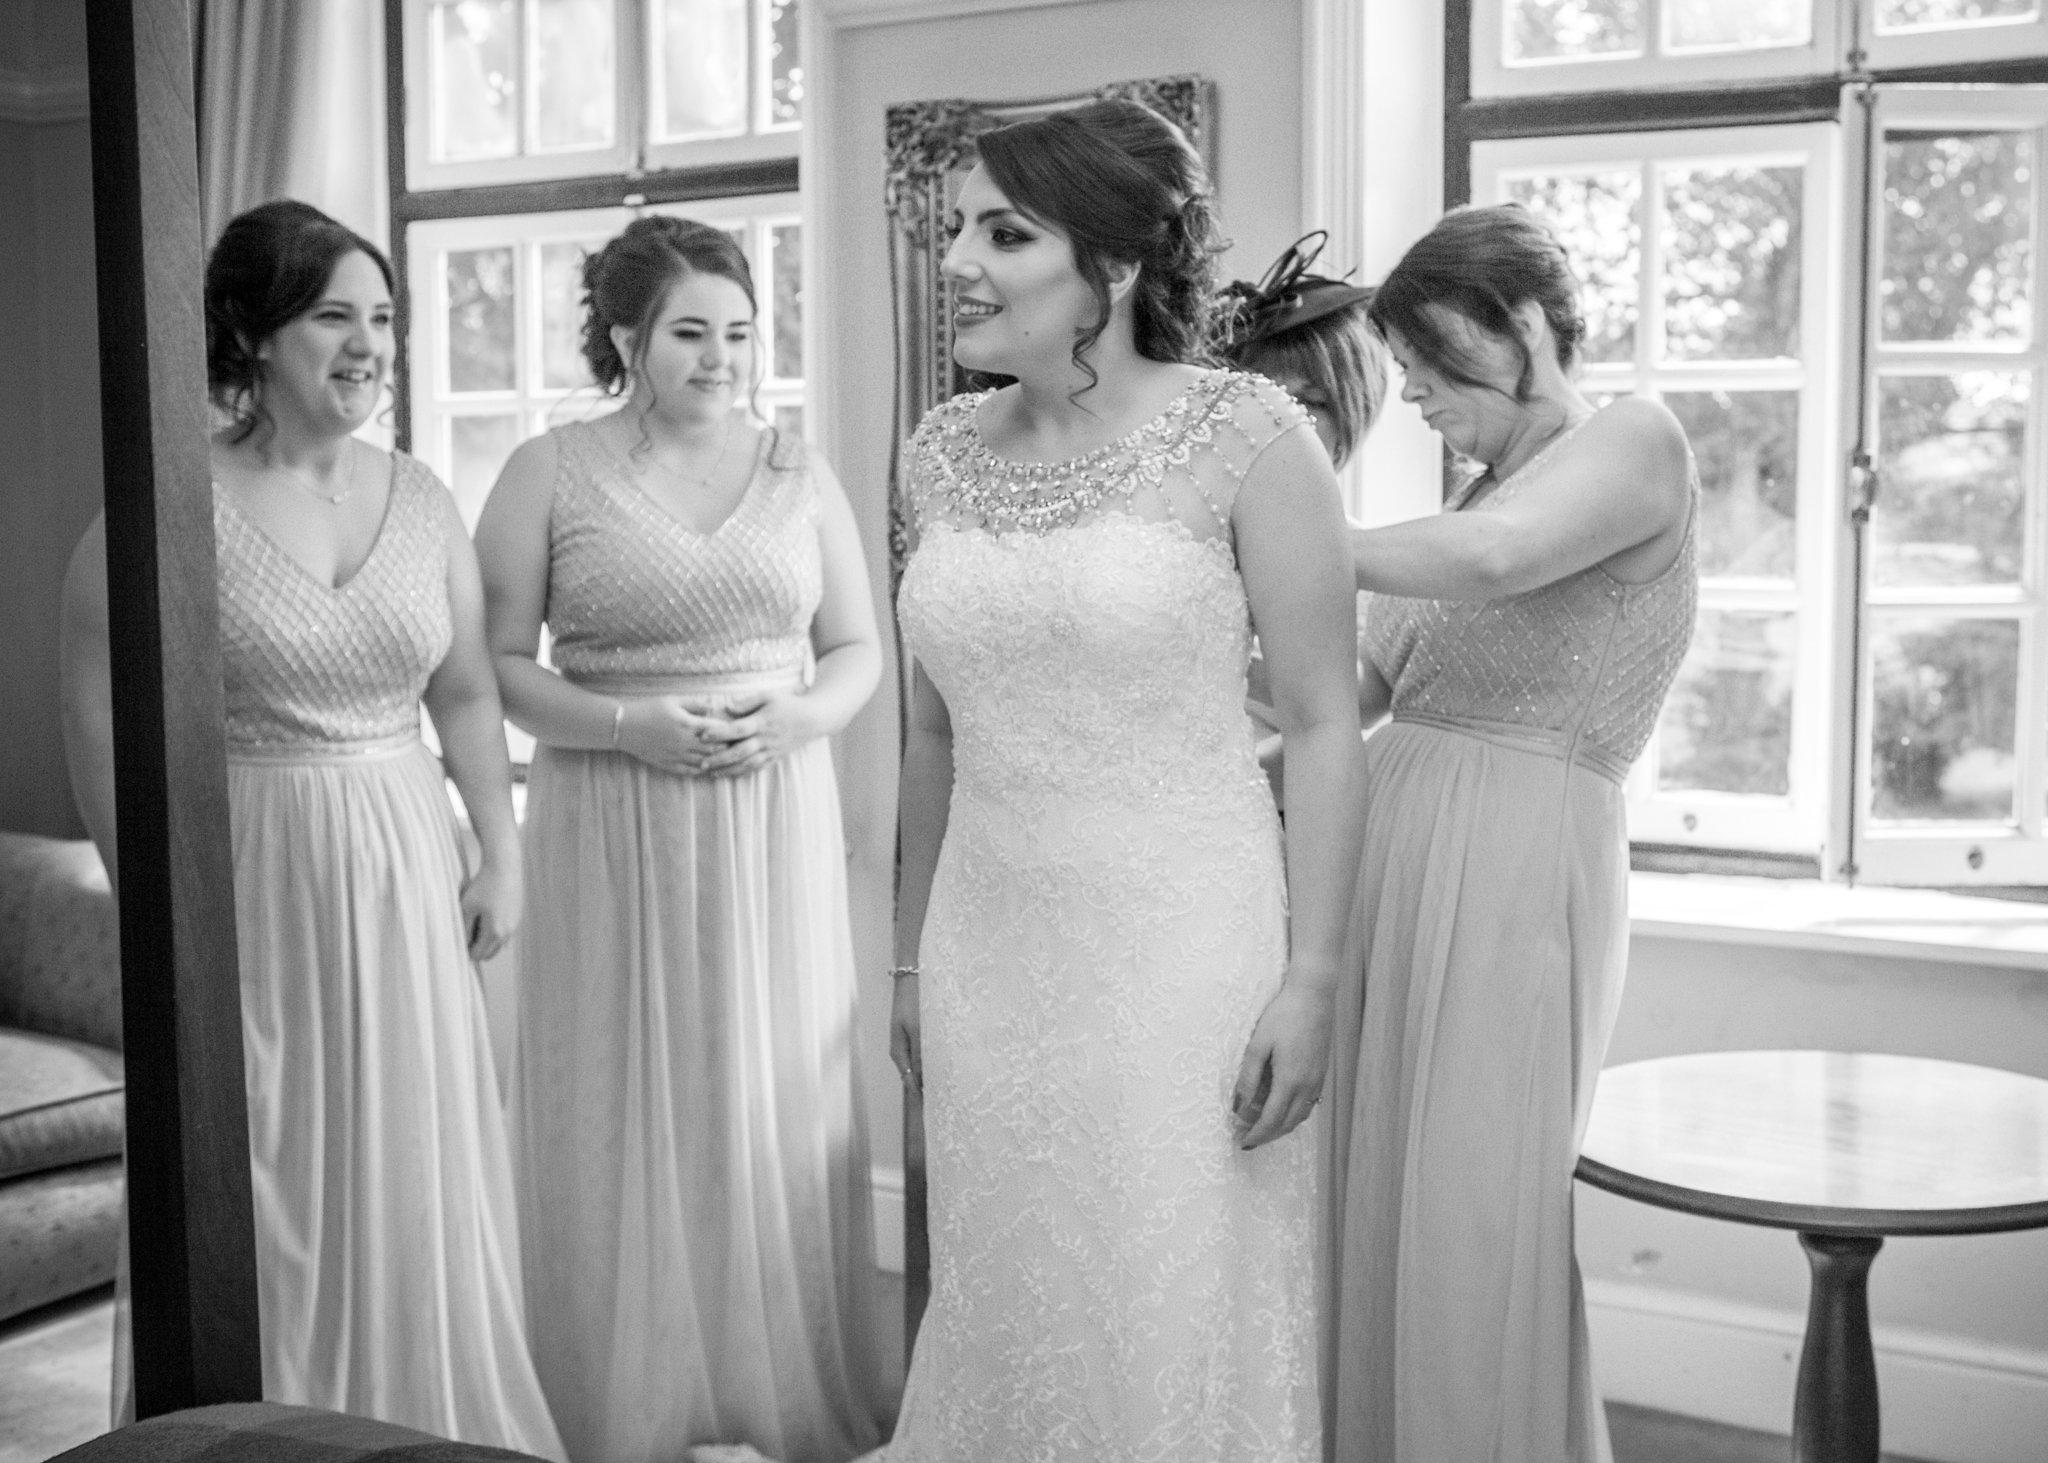 Bridal Preparations, Llansantffraed Court Wedding, Tania Miller Photography, Abergavenny wedding photographer, wedding photography Cwmbran